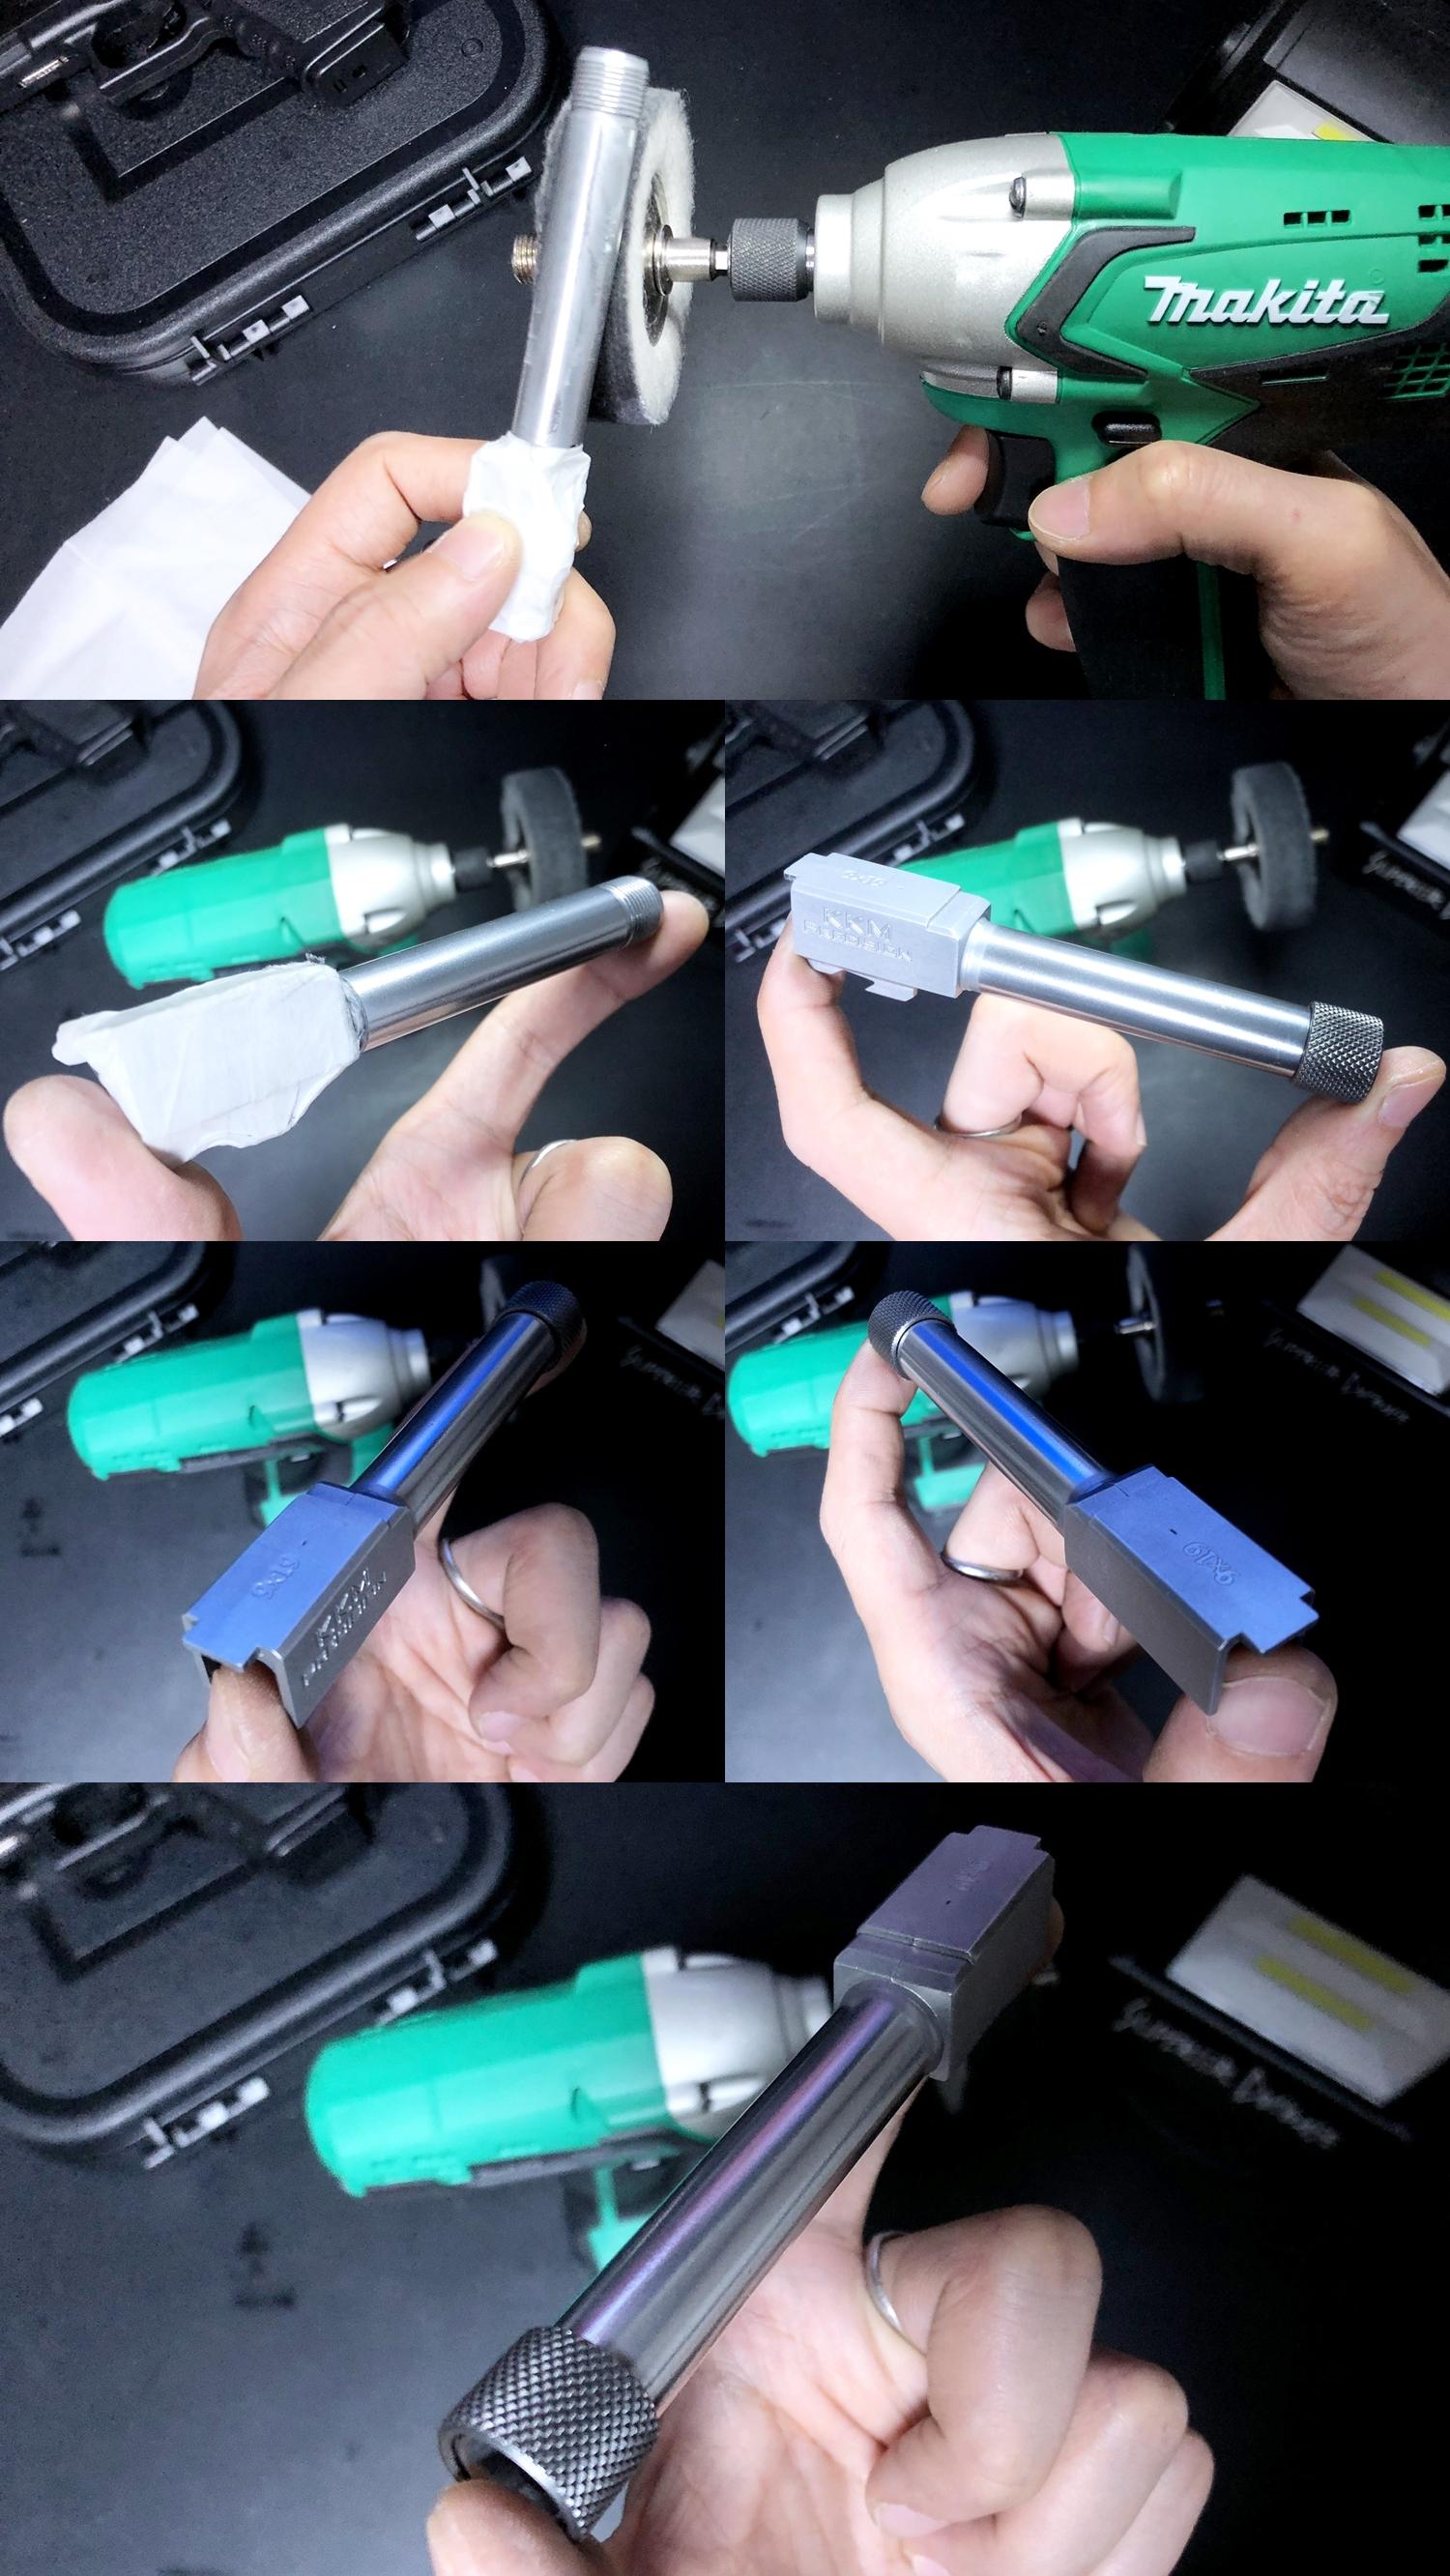 9 KKM MATCH BARREL + PROTECTOR KJ WORKS G19 TYPE & COMPENSATOR β-VERSION HILOG ORIGINAL 3D MOCKUP!! 『SUPDEFG19』自力で作るぞ大作戦!! 最も重要なアウターバレル&コンペンセイターの準備は整った!! DIY サン